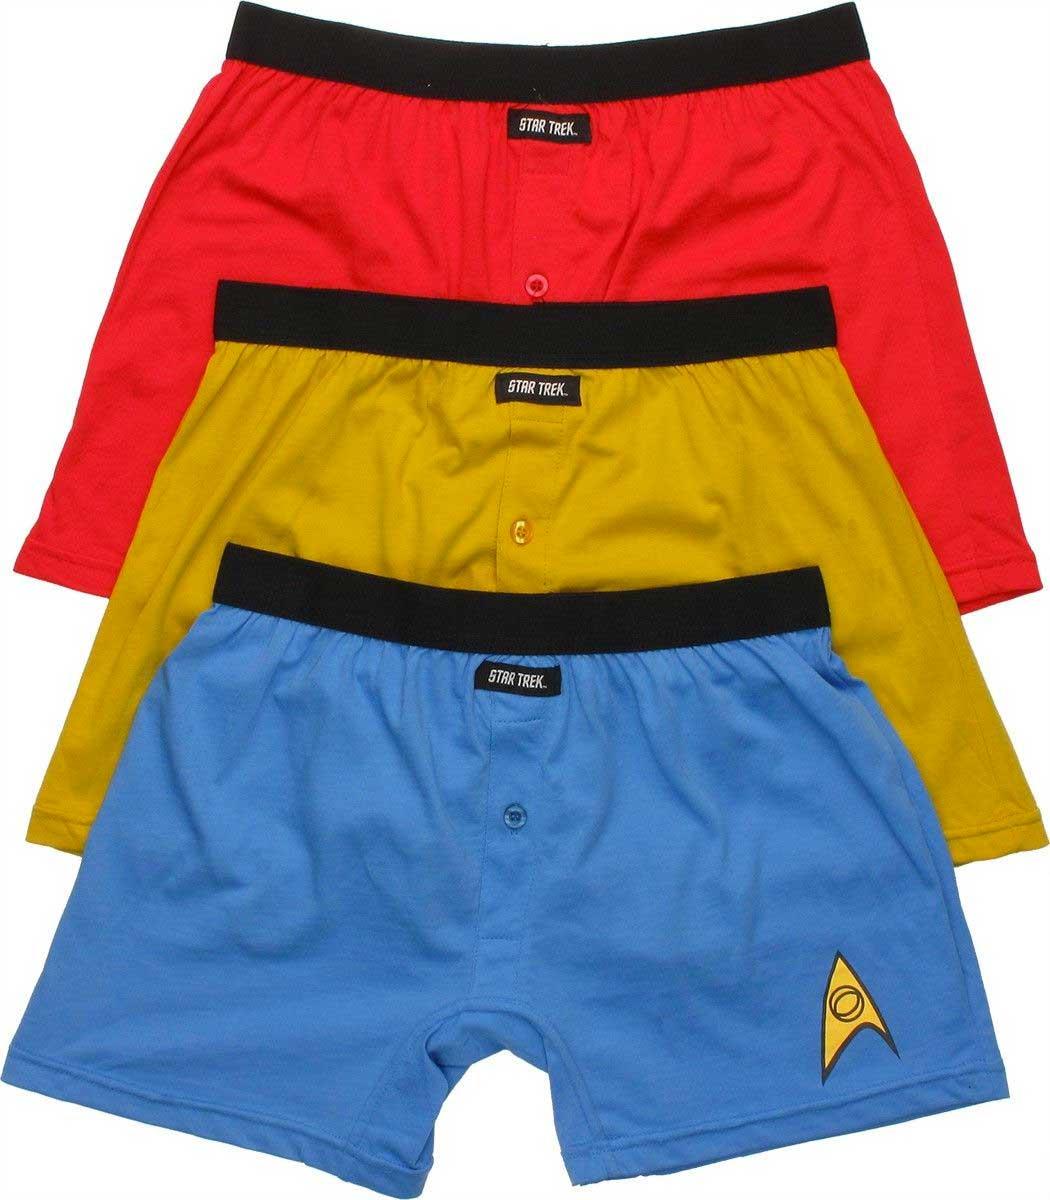 88bdf8187b Stun Your Partner In The Bedroom With Sexy Star Trek Underwear